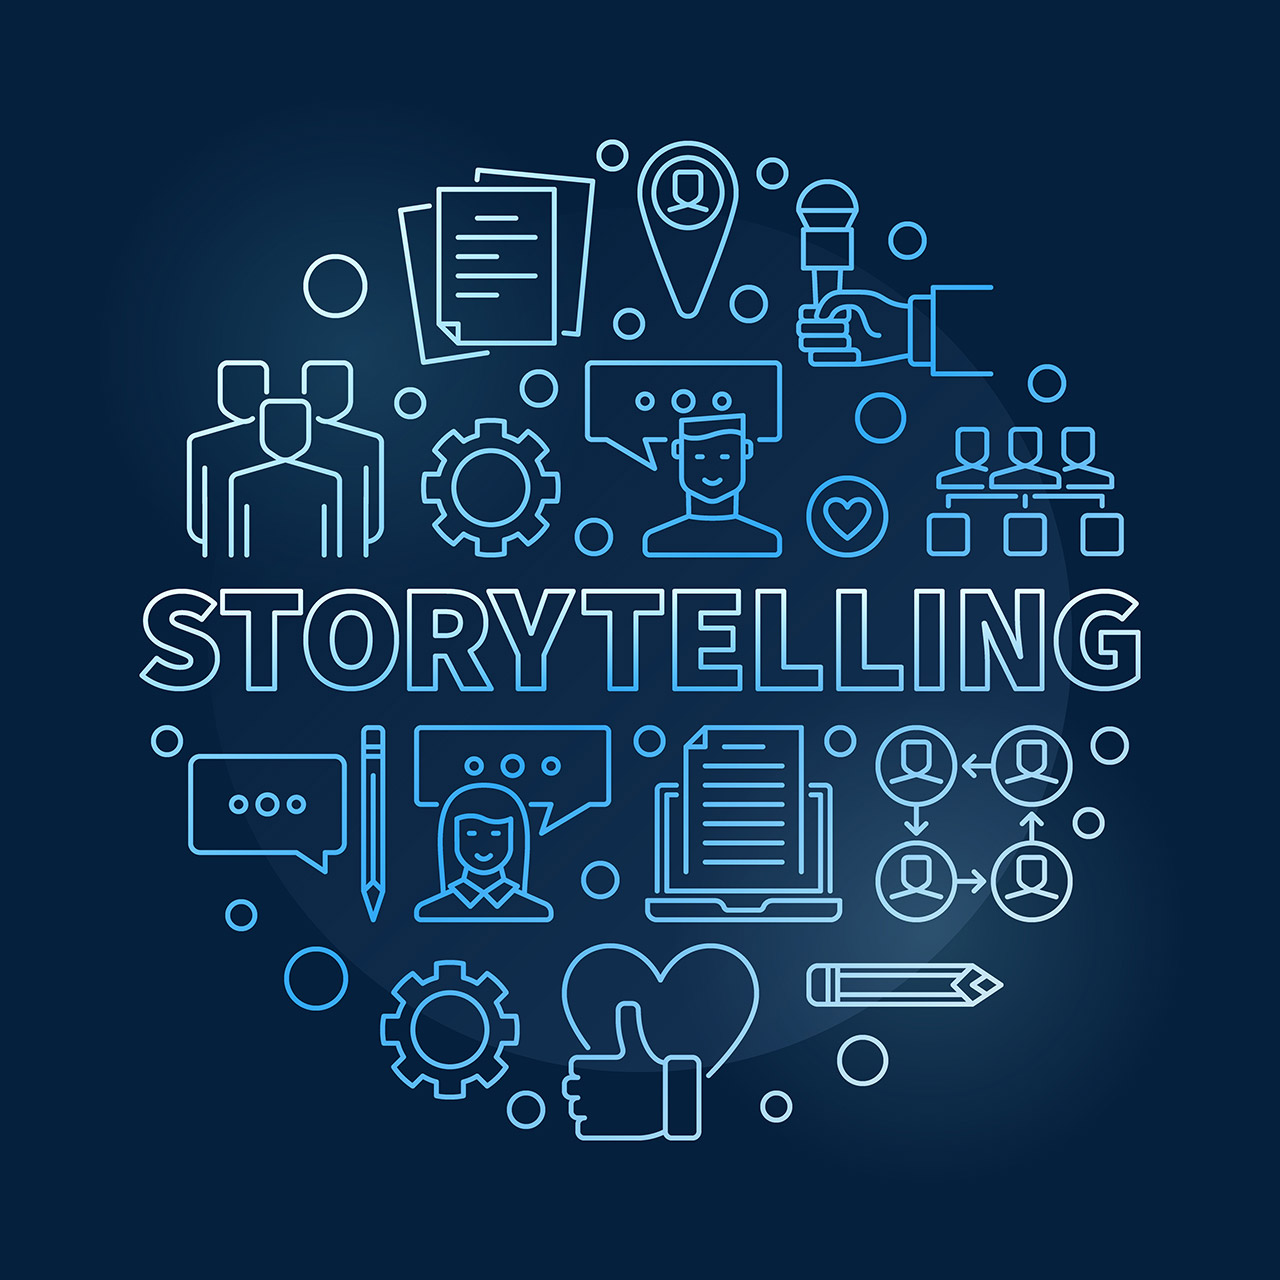 SEO / Content Marketing - Storytelling